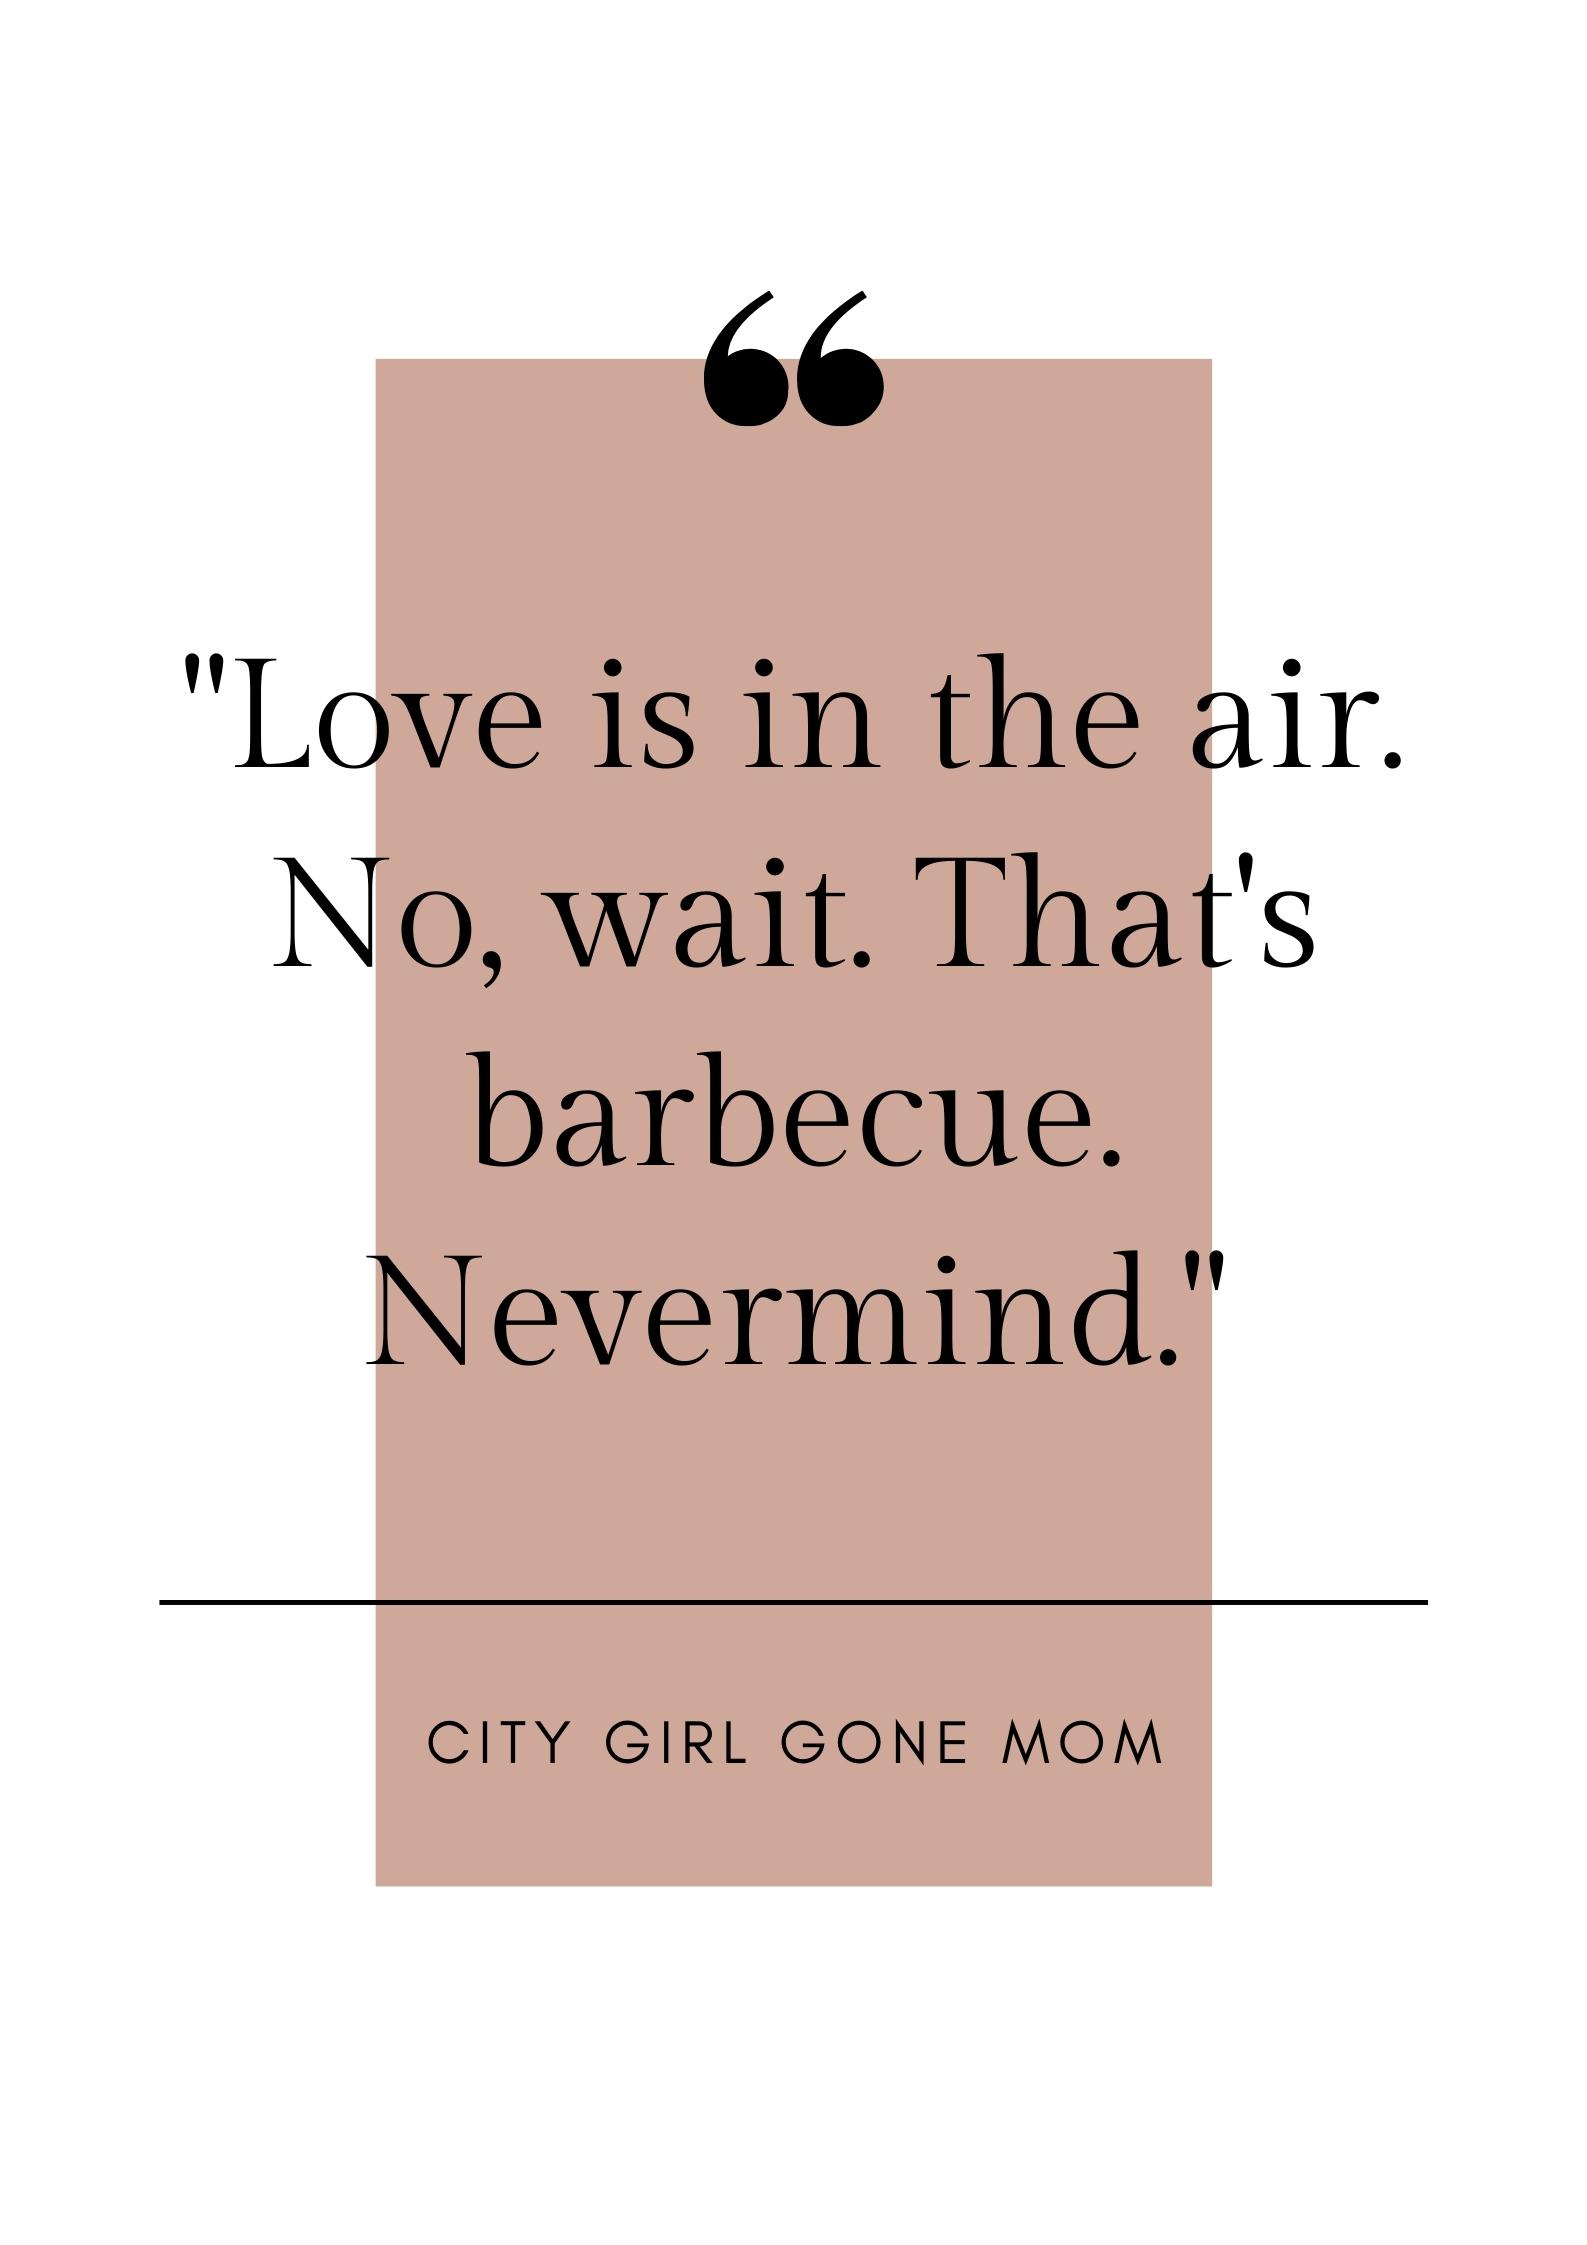 funny barbecue quote